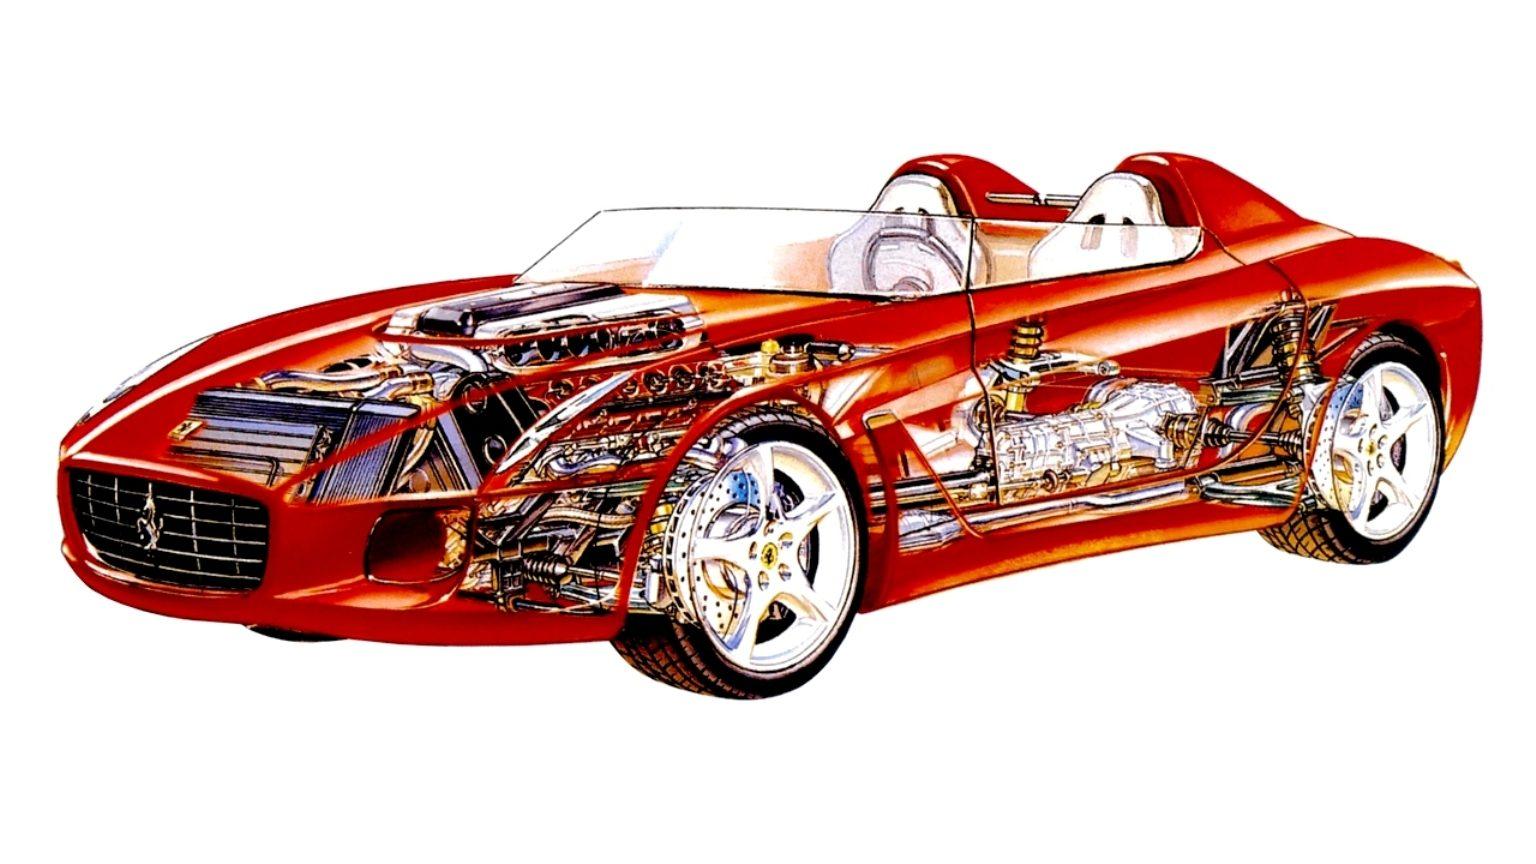 Ferrari-Rossa-Concept-2000.jpg